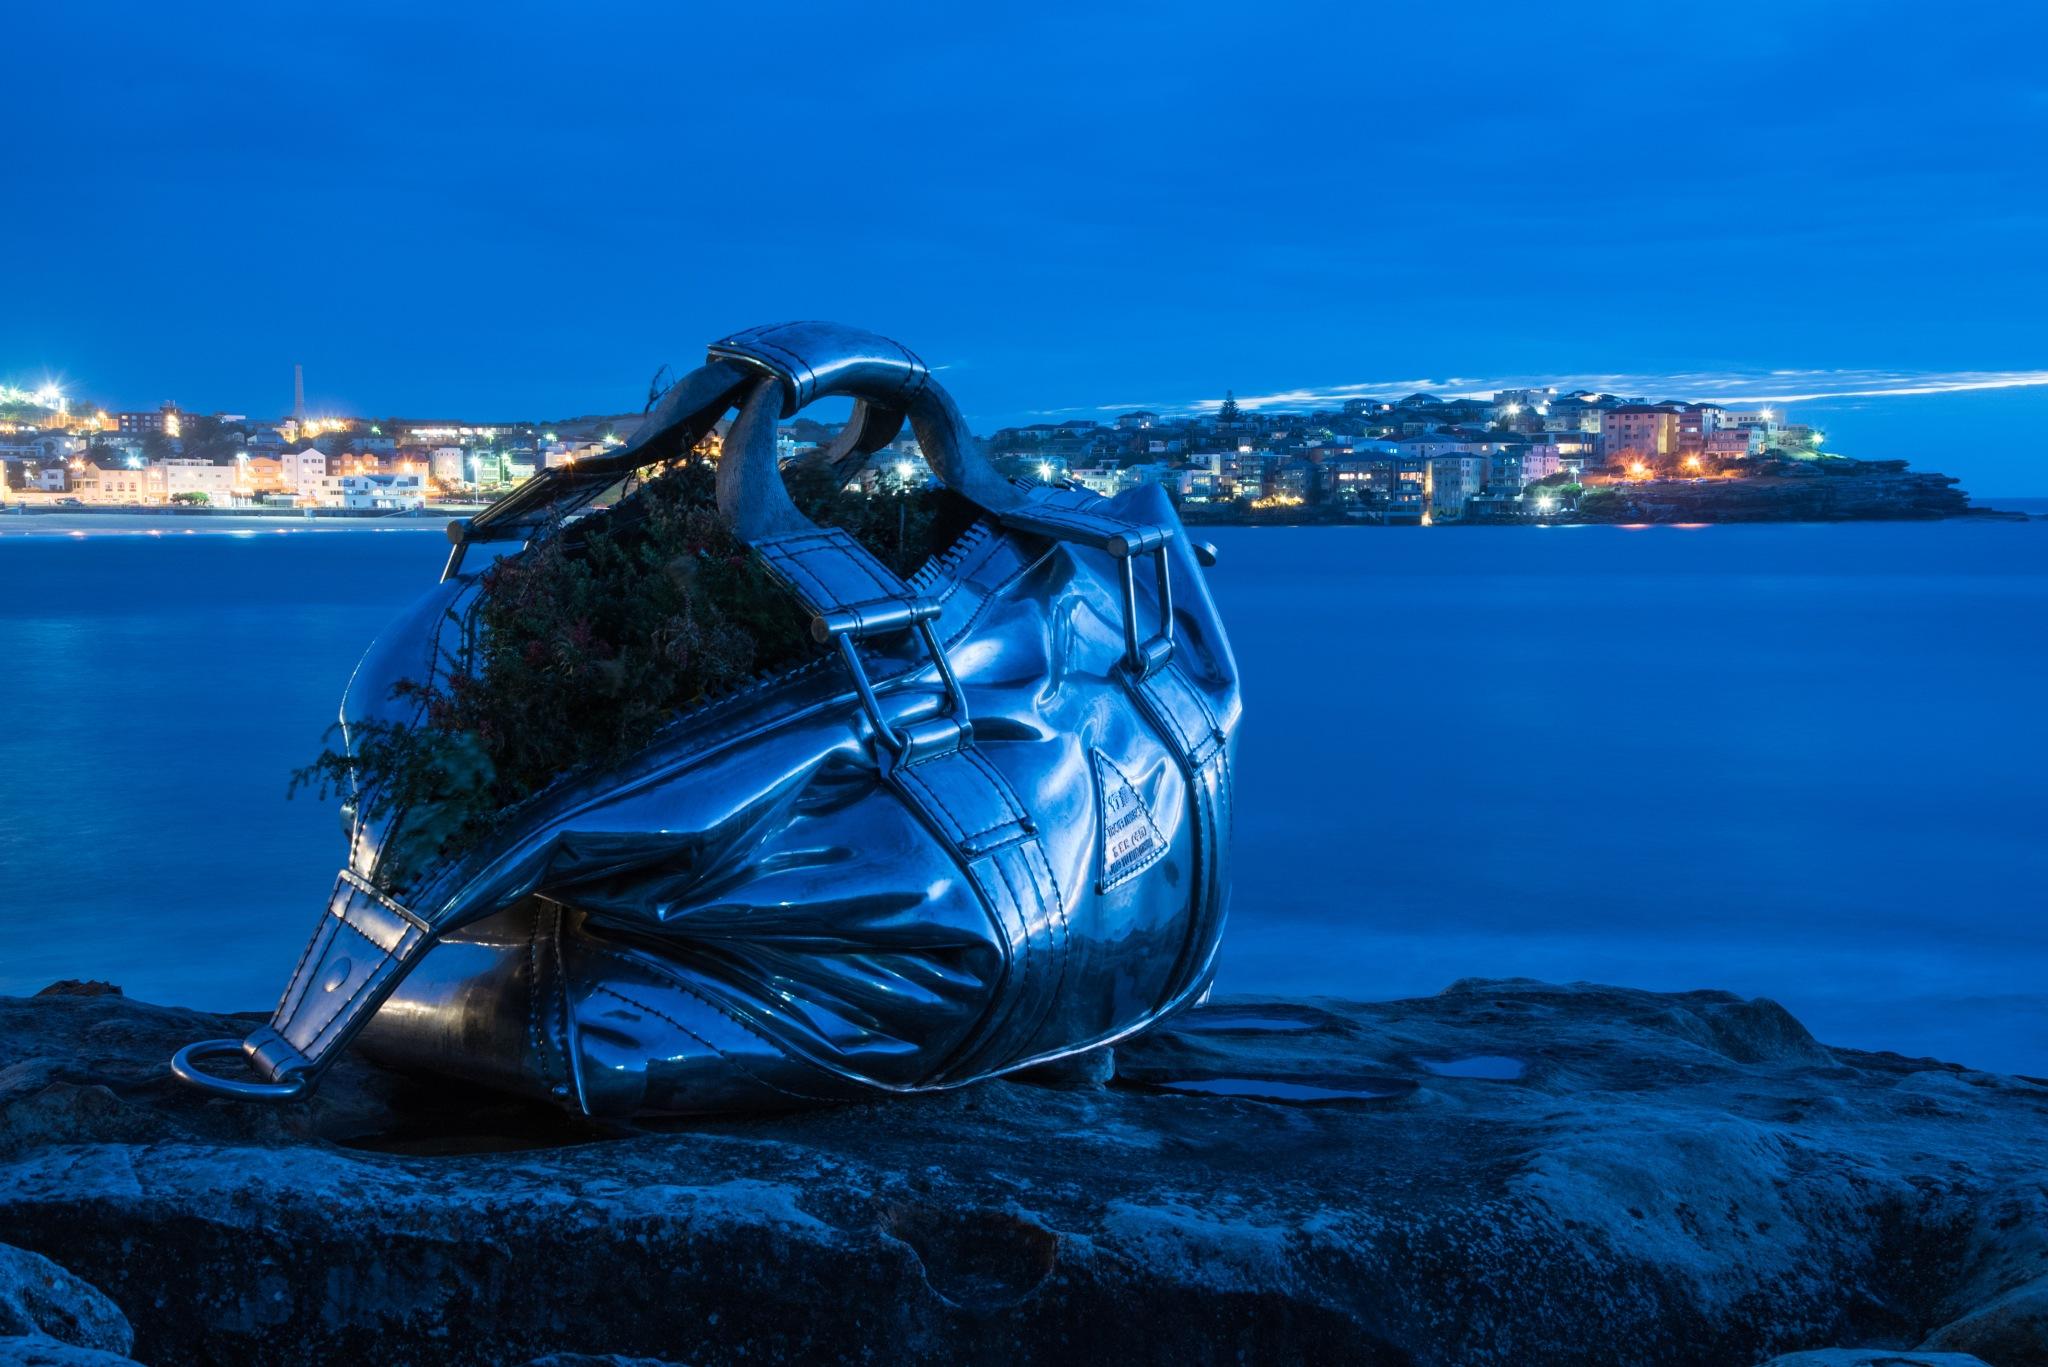 Sculptors by the Sea Bondi Beach by marilyncov